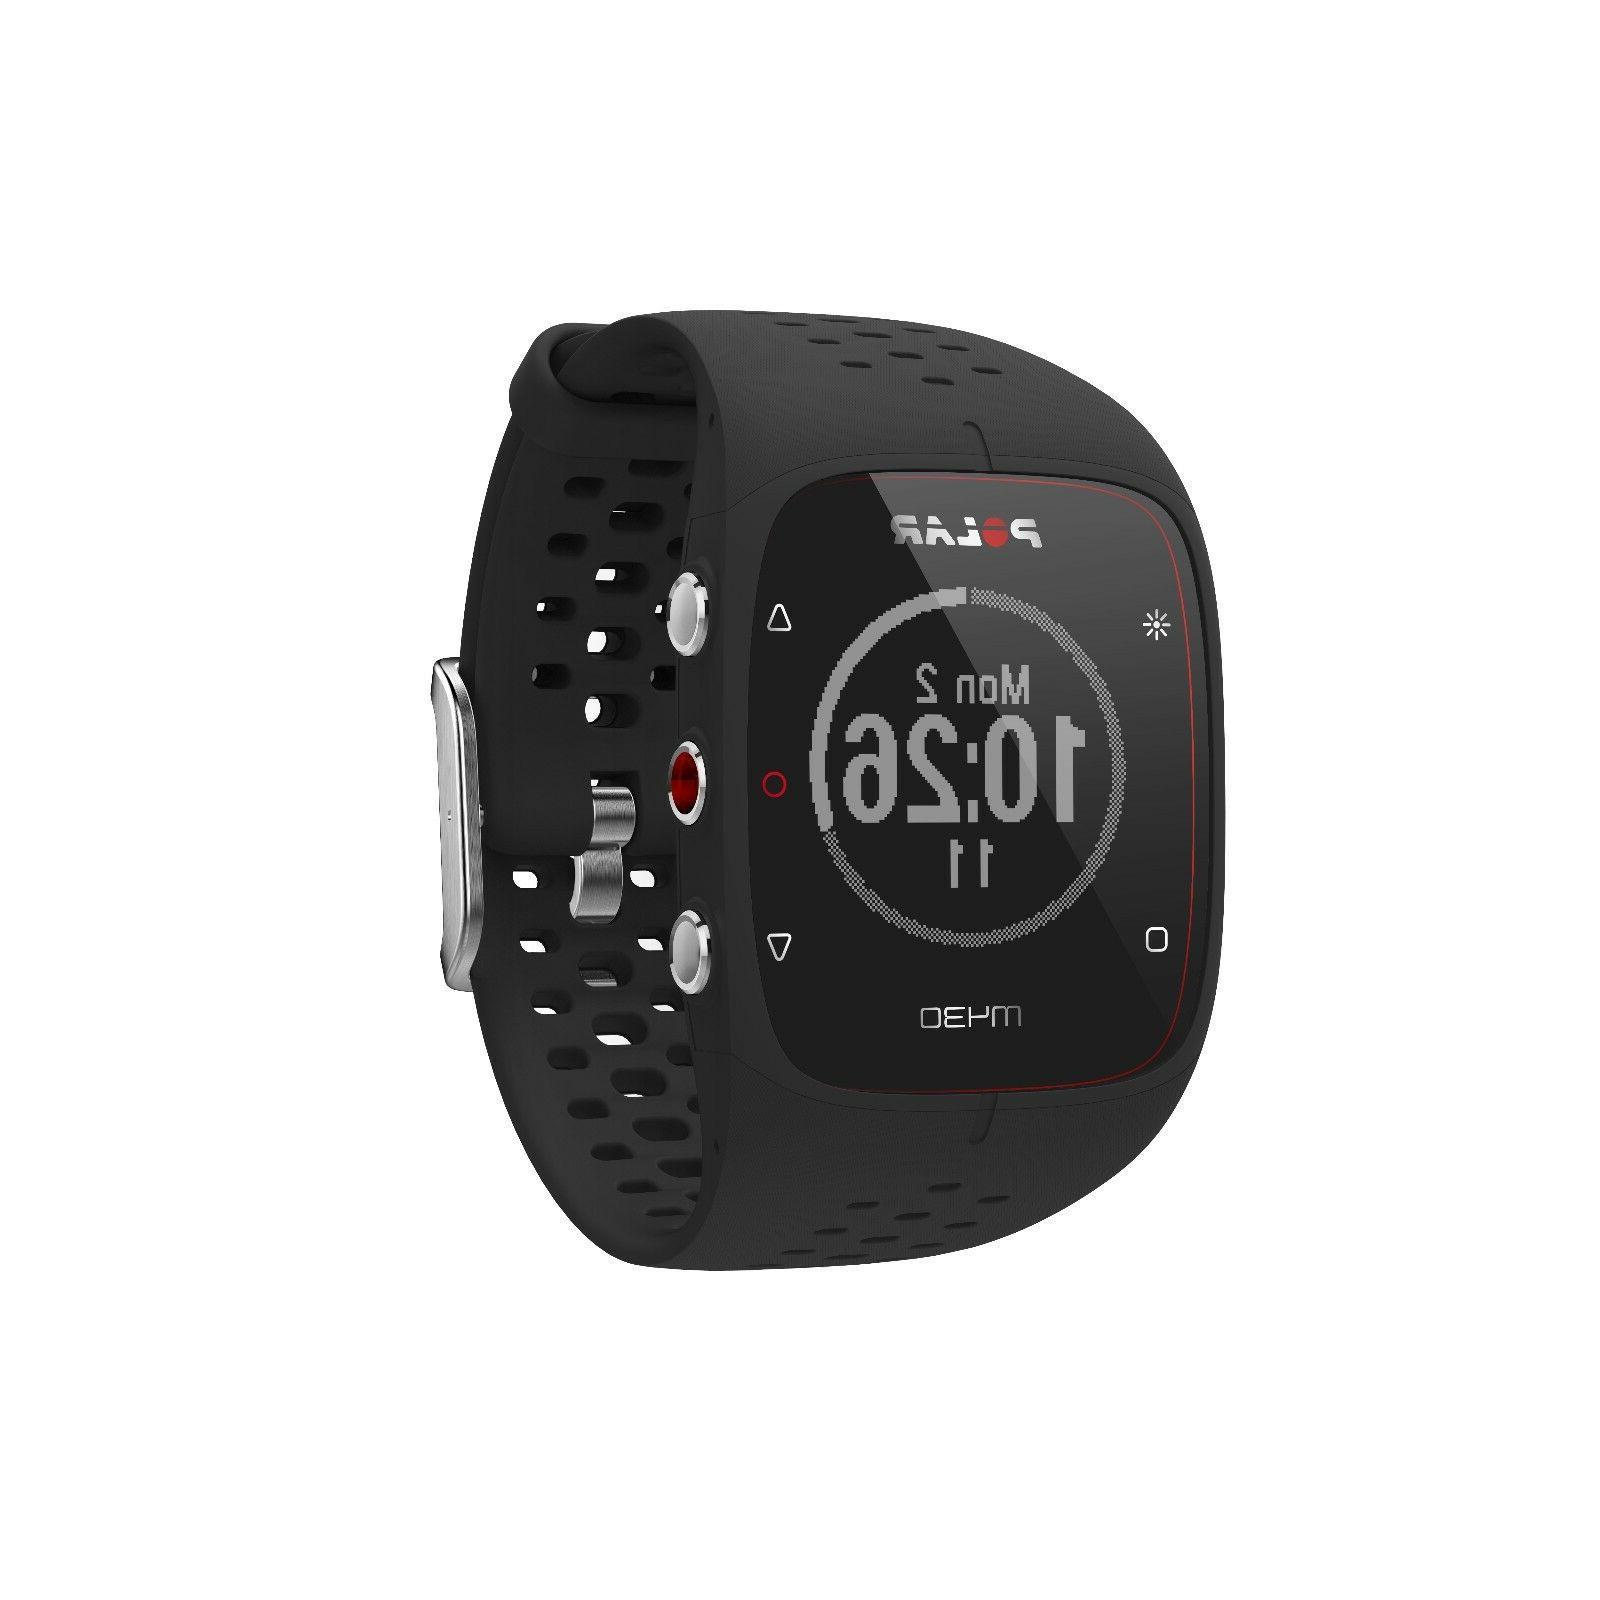 Polar M430 watch wrist-based heart